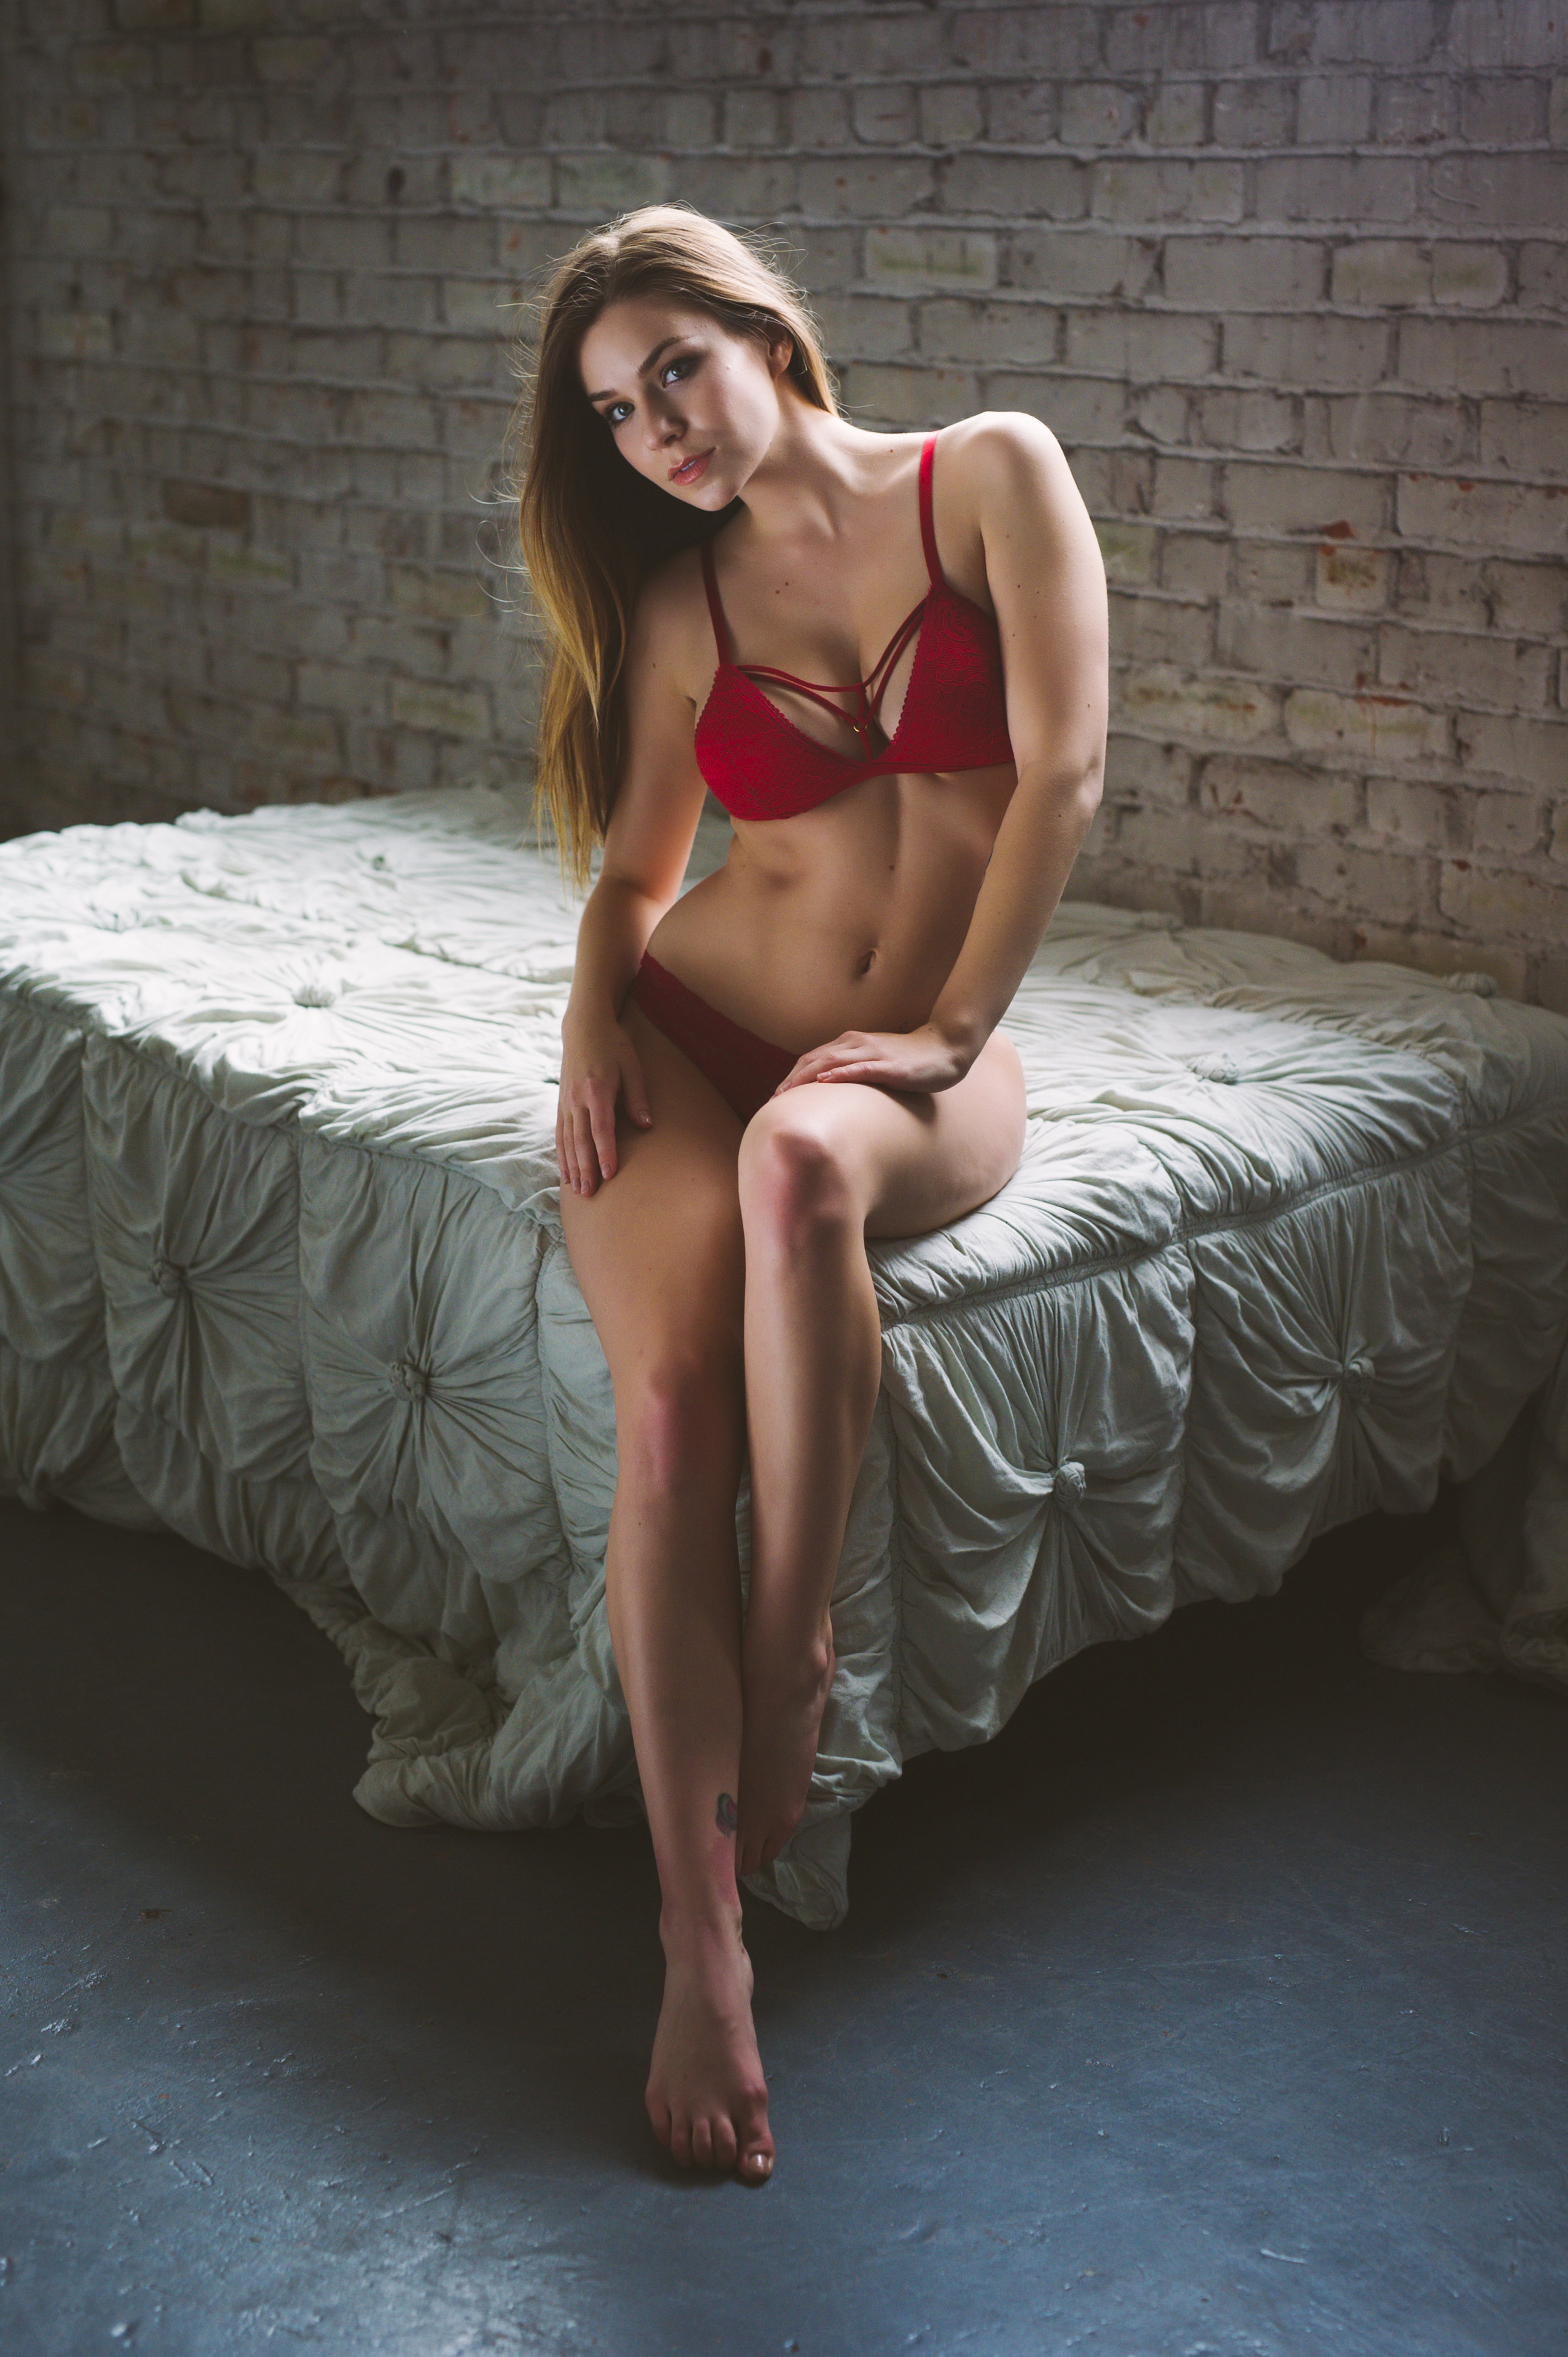 StephanieModelPortland-73.jpg